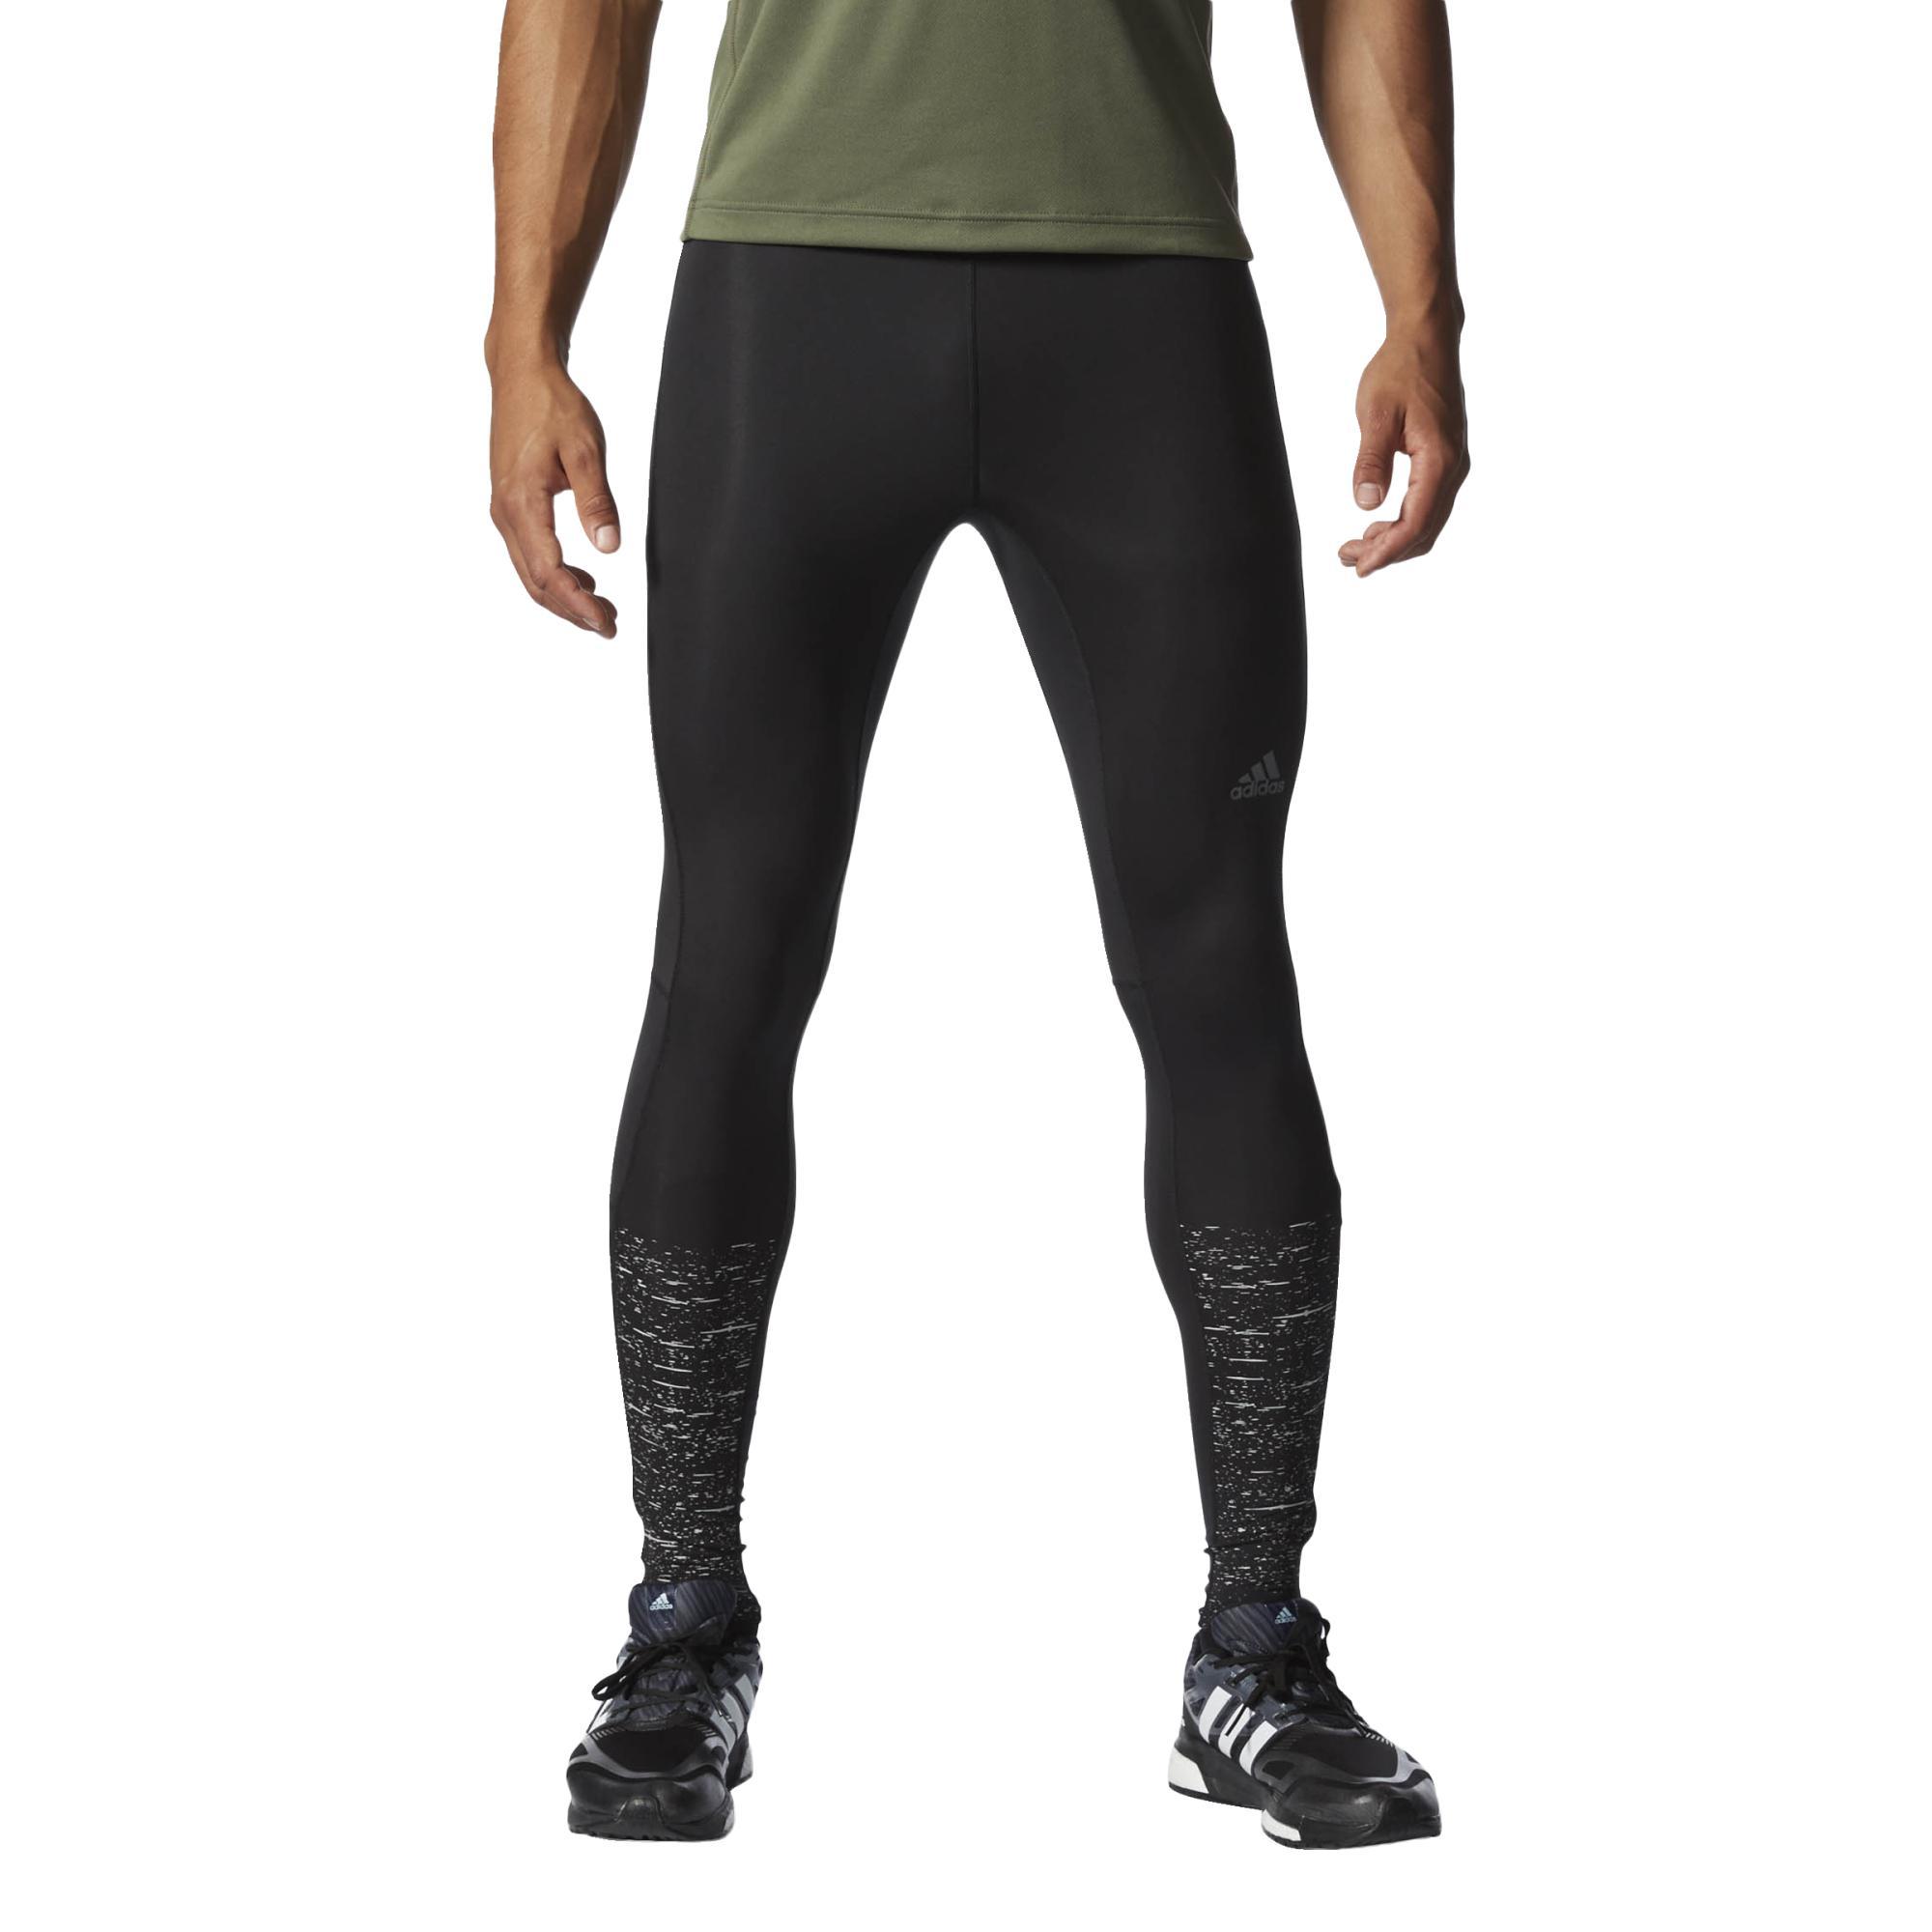 e645cda1e Pánské běžecké legíny adidas SUPERNOVA GRAPHIC LONG TIGHT MEN černé ...